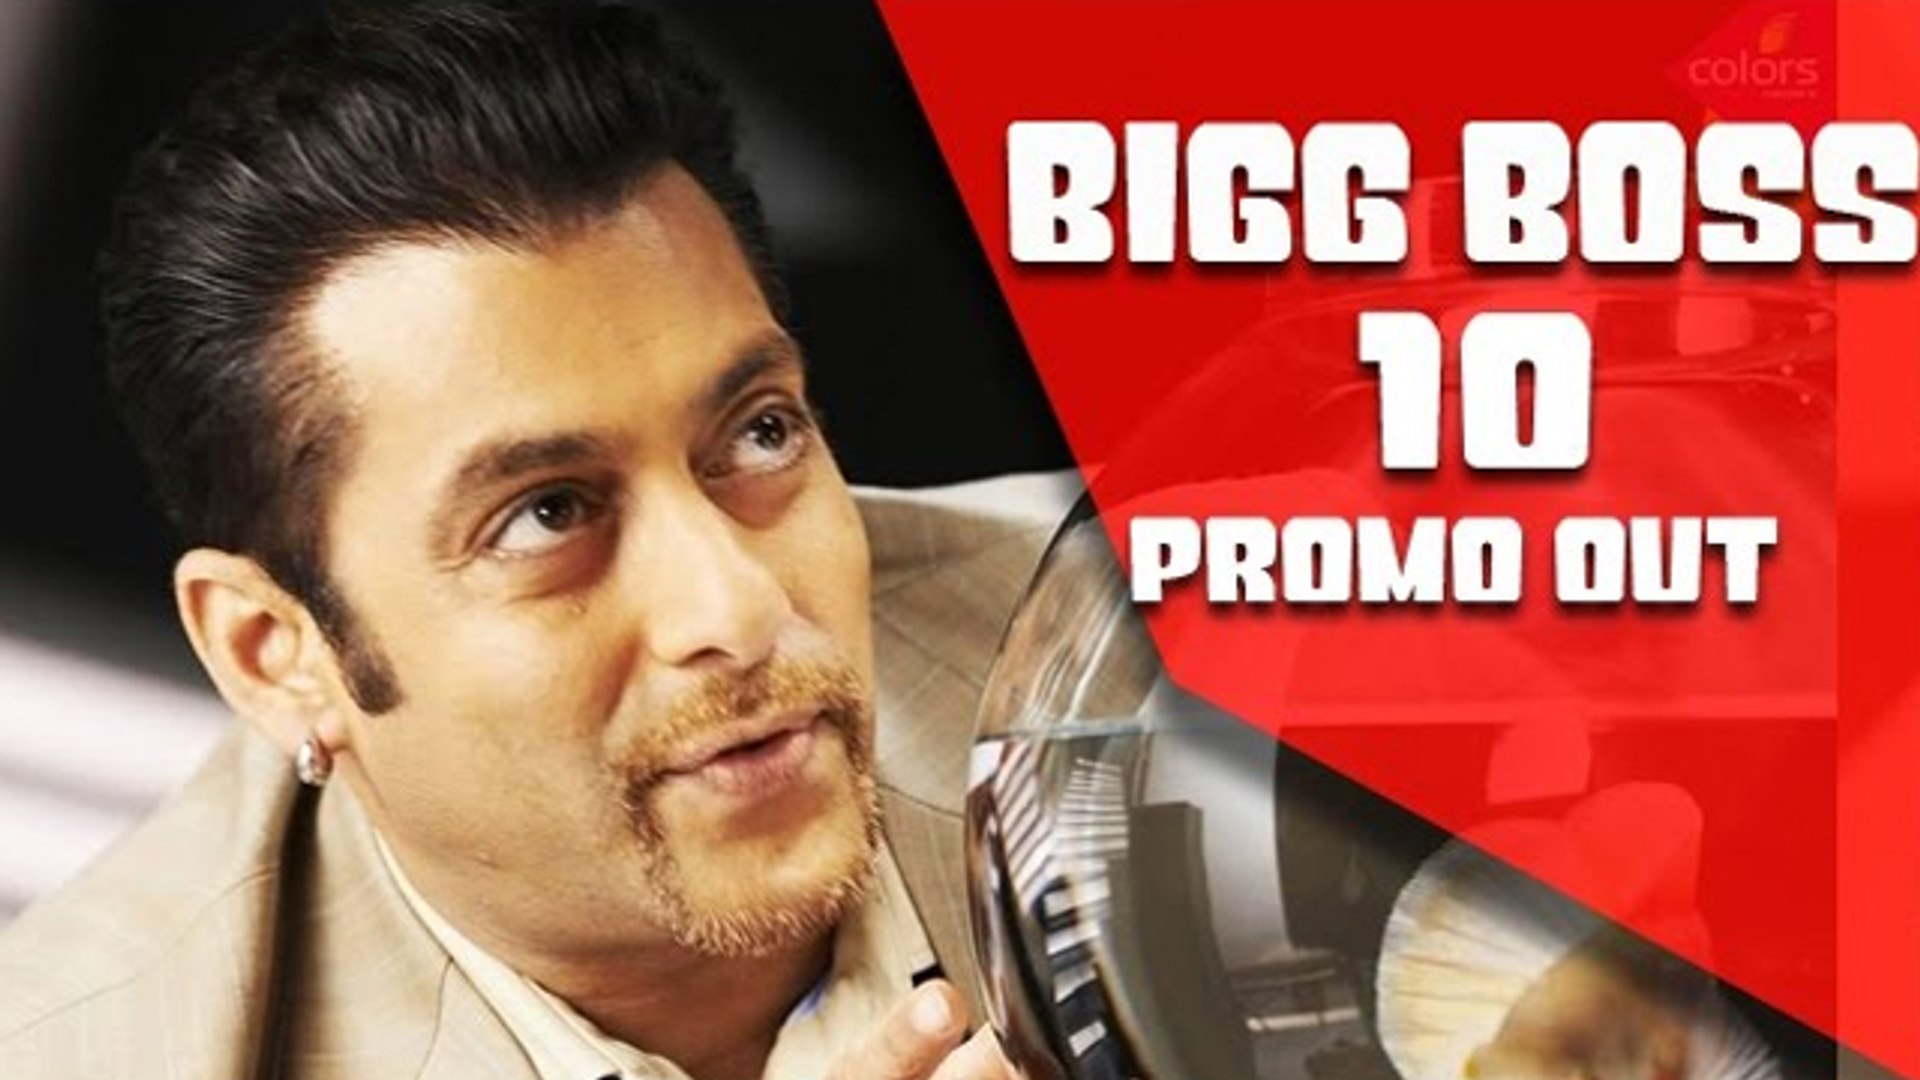 Bigg Boss 10 OFFICIAL PROMO | Salman Khan | Releases